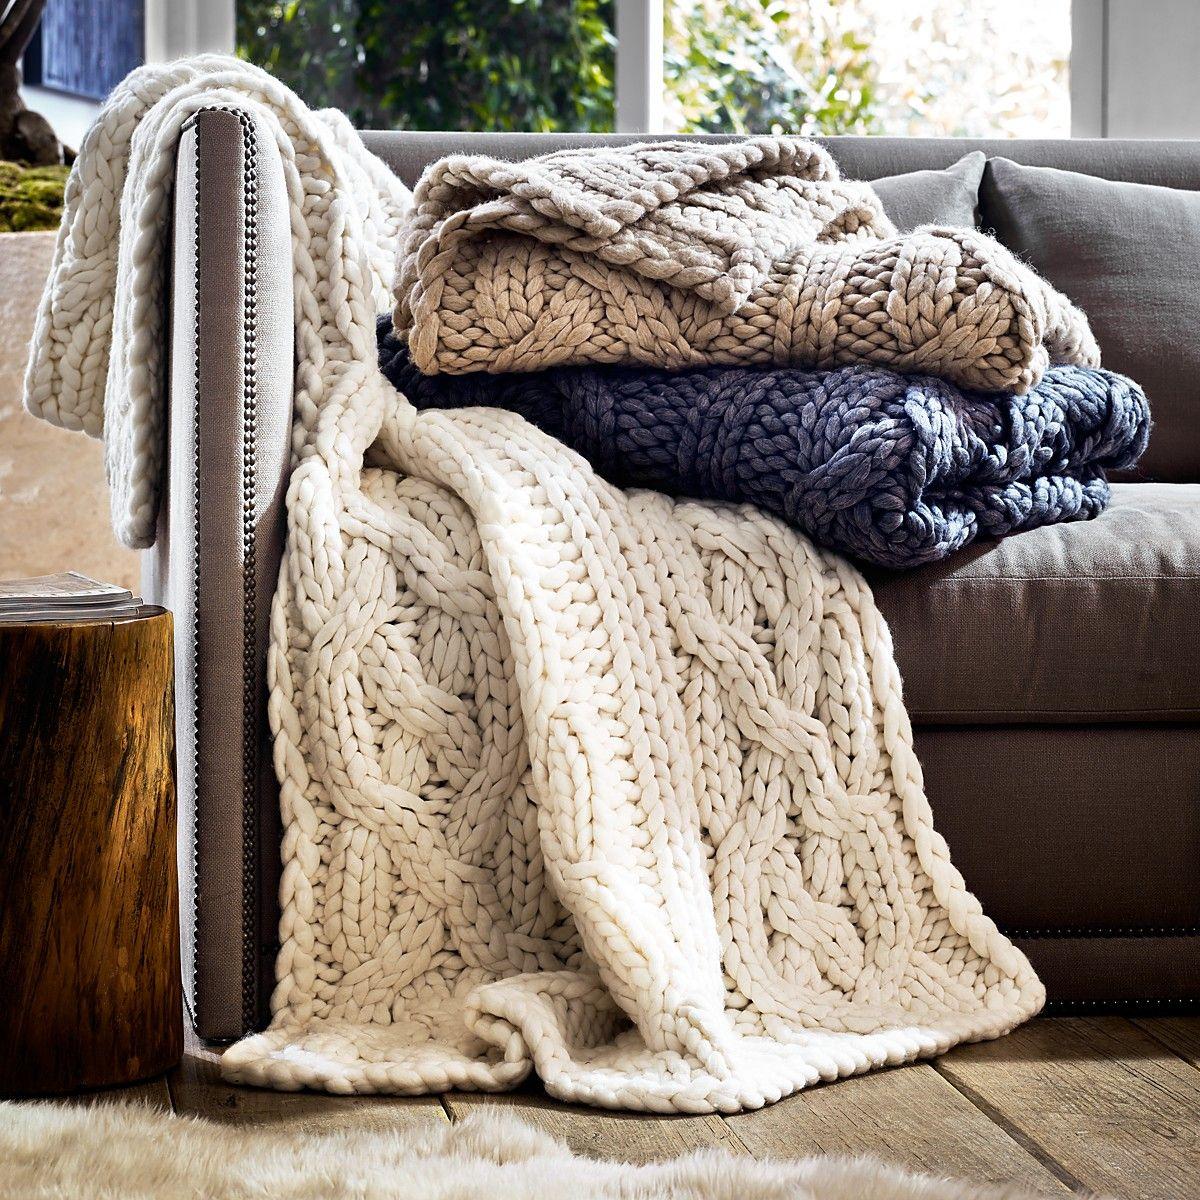 Ugg 174 Australia Oversized Knit Blanket 50 Quot X 70